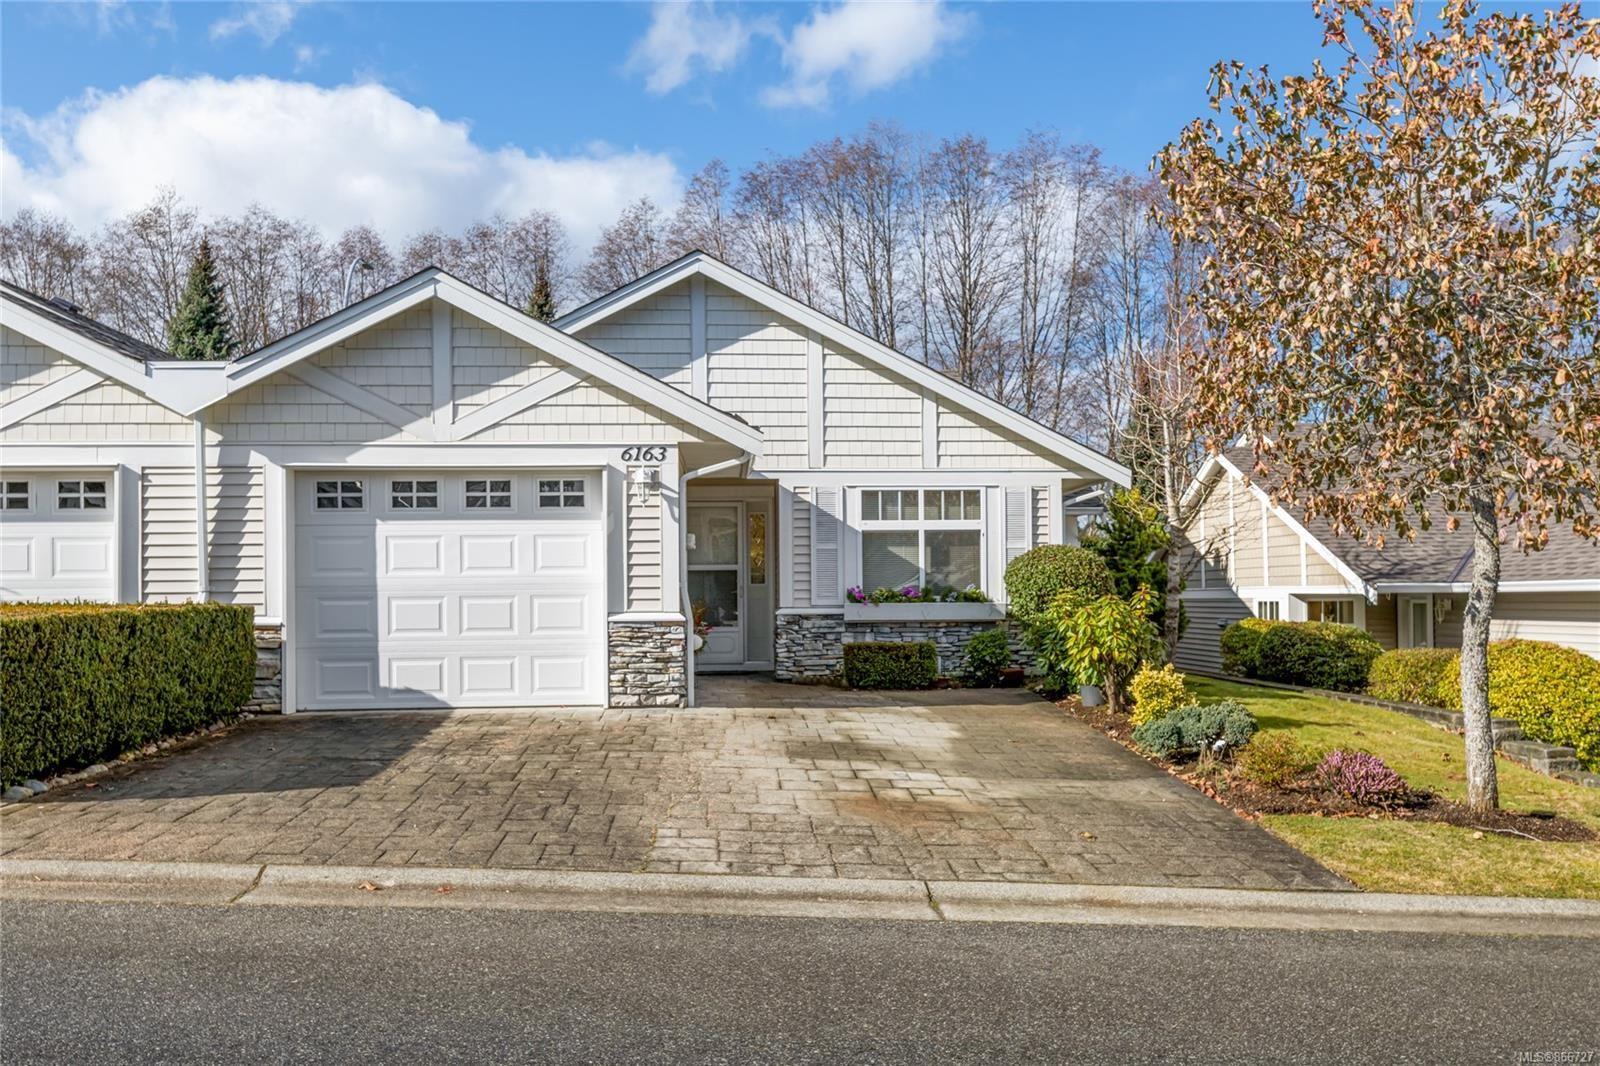 Main Photo: 6163 Rosecroft Pl in : Na North Nanaimo Row/Townhouse for sale (Nanaimo)  : MLS®# 866727